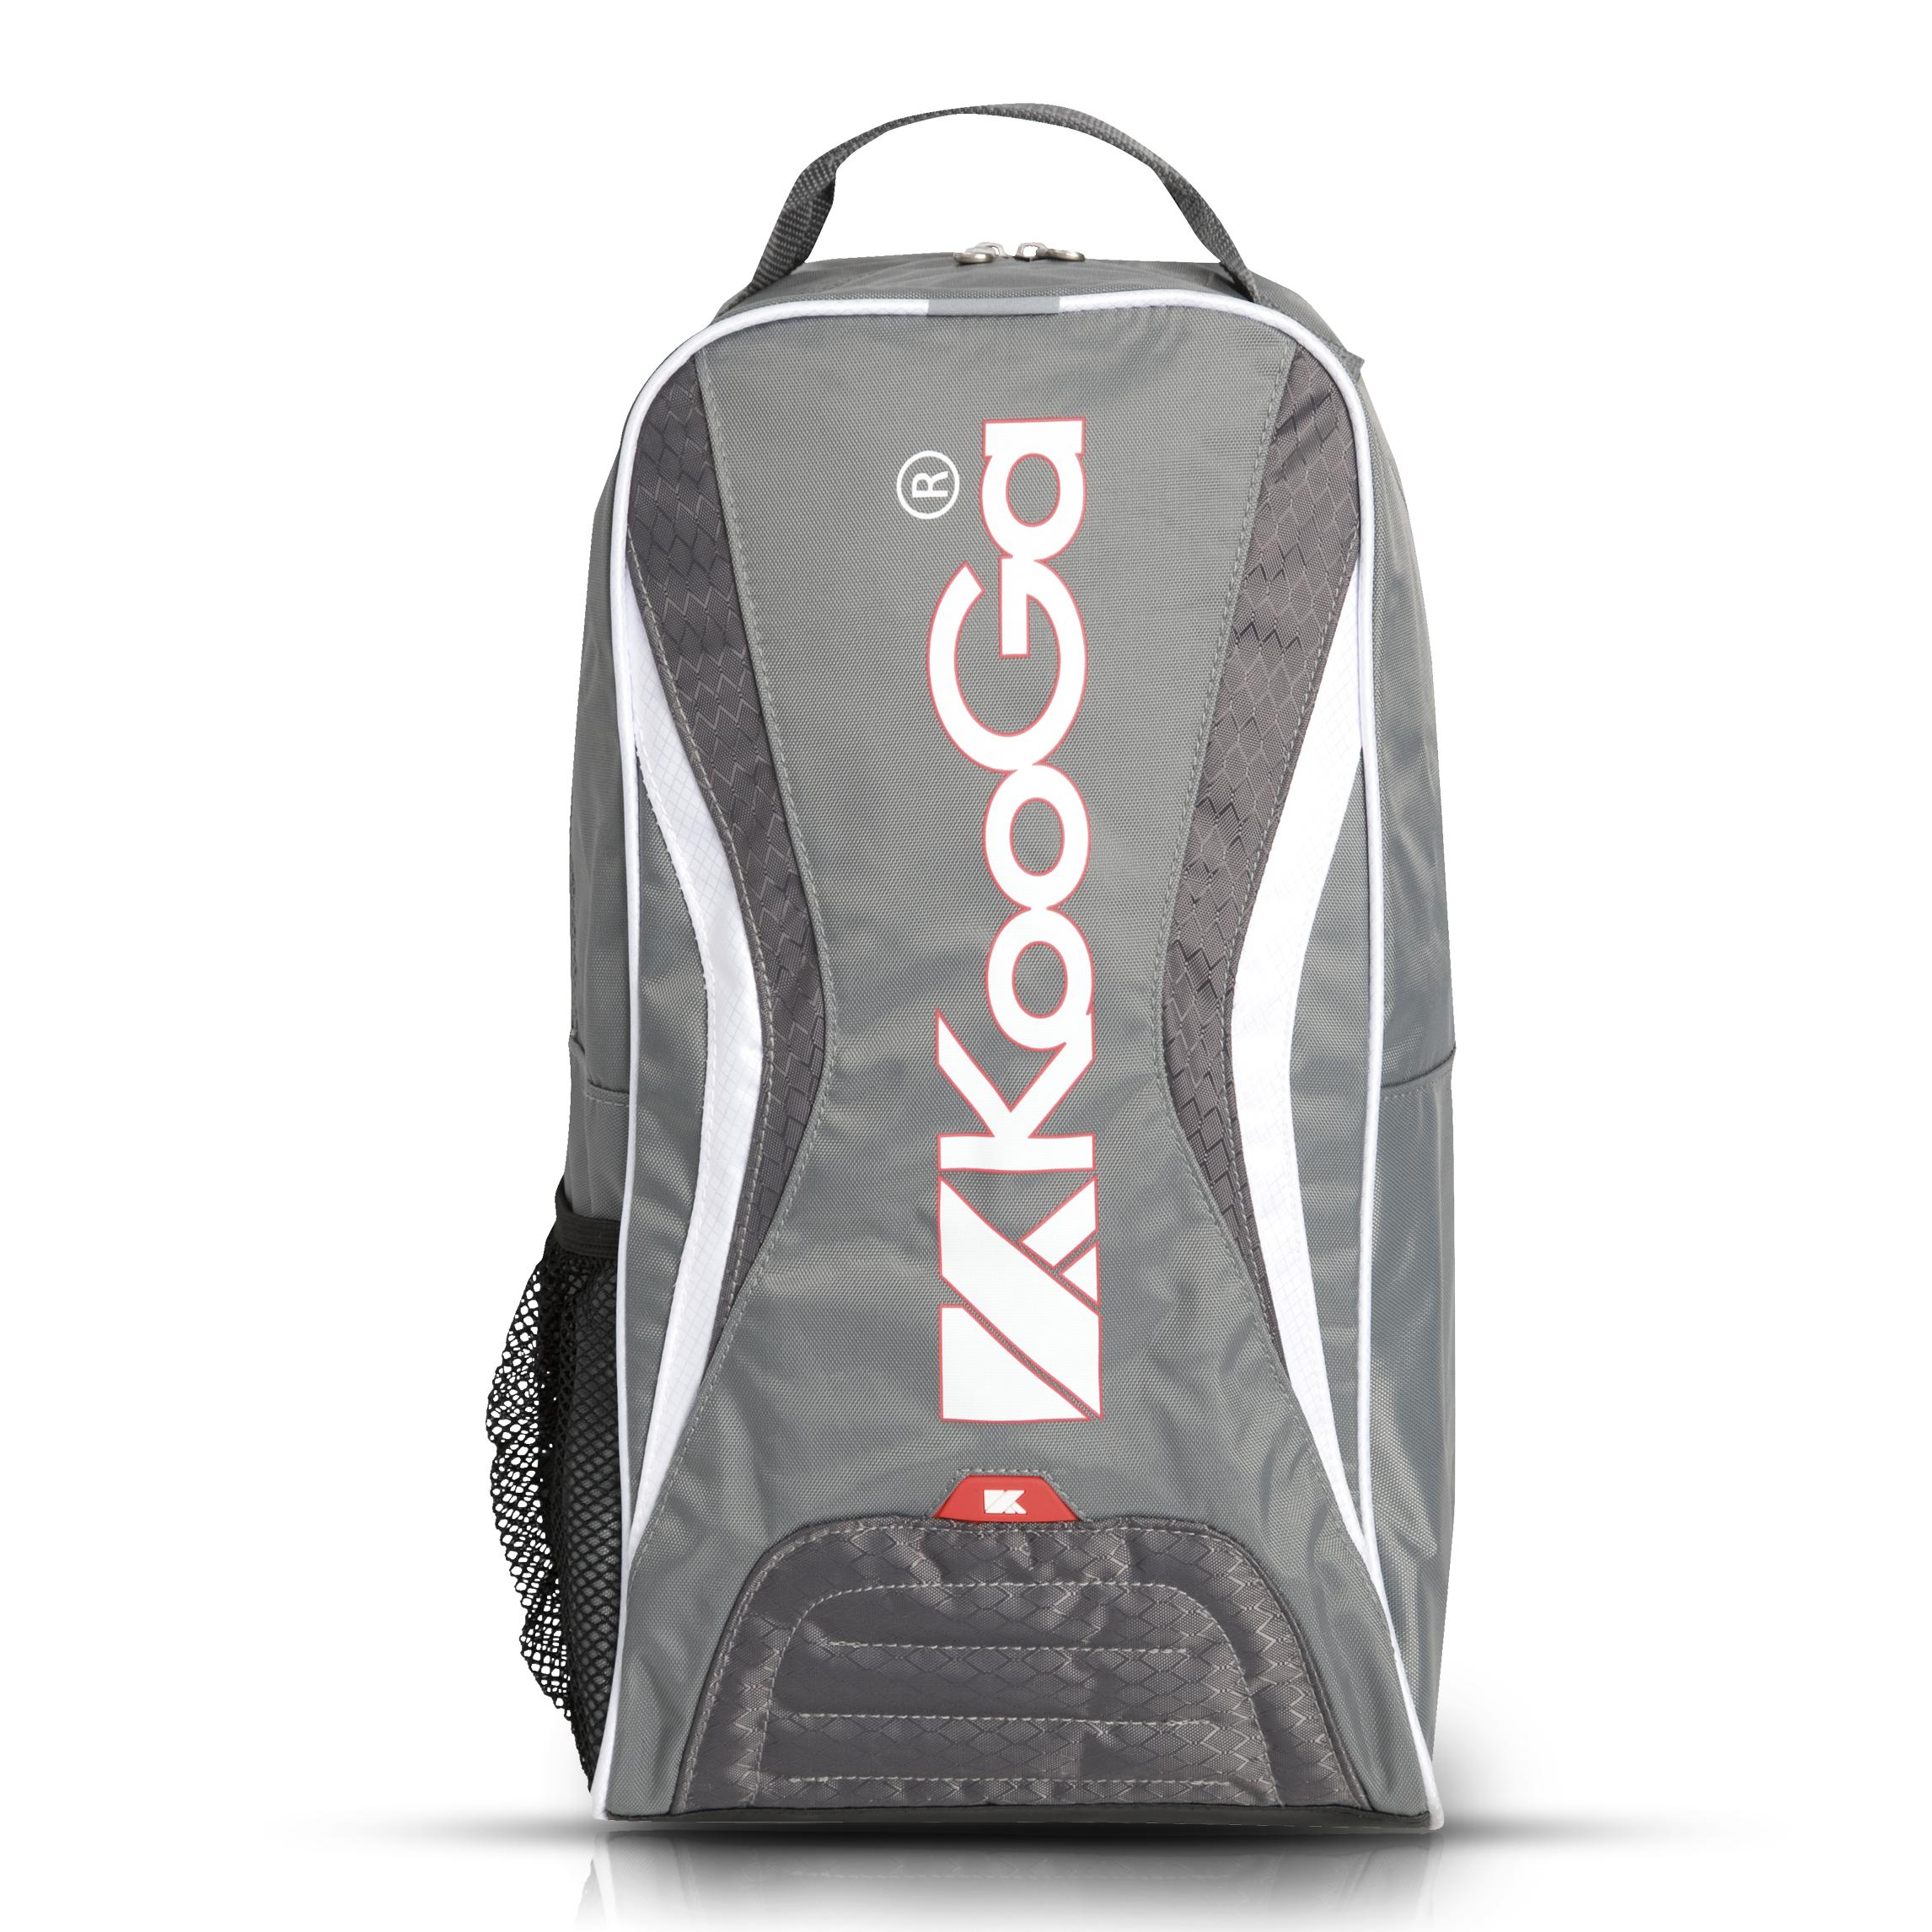 Kooga Rugby Boot Bag